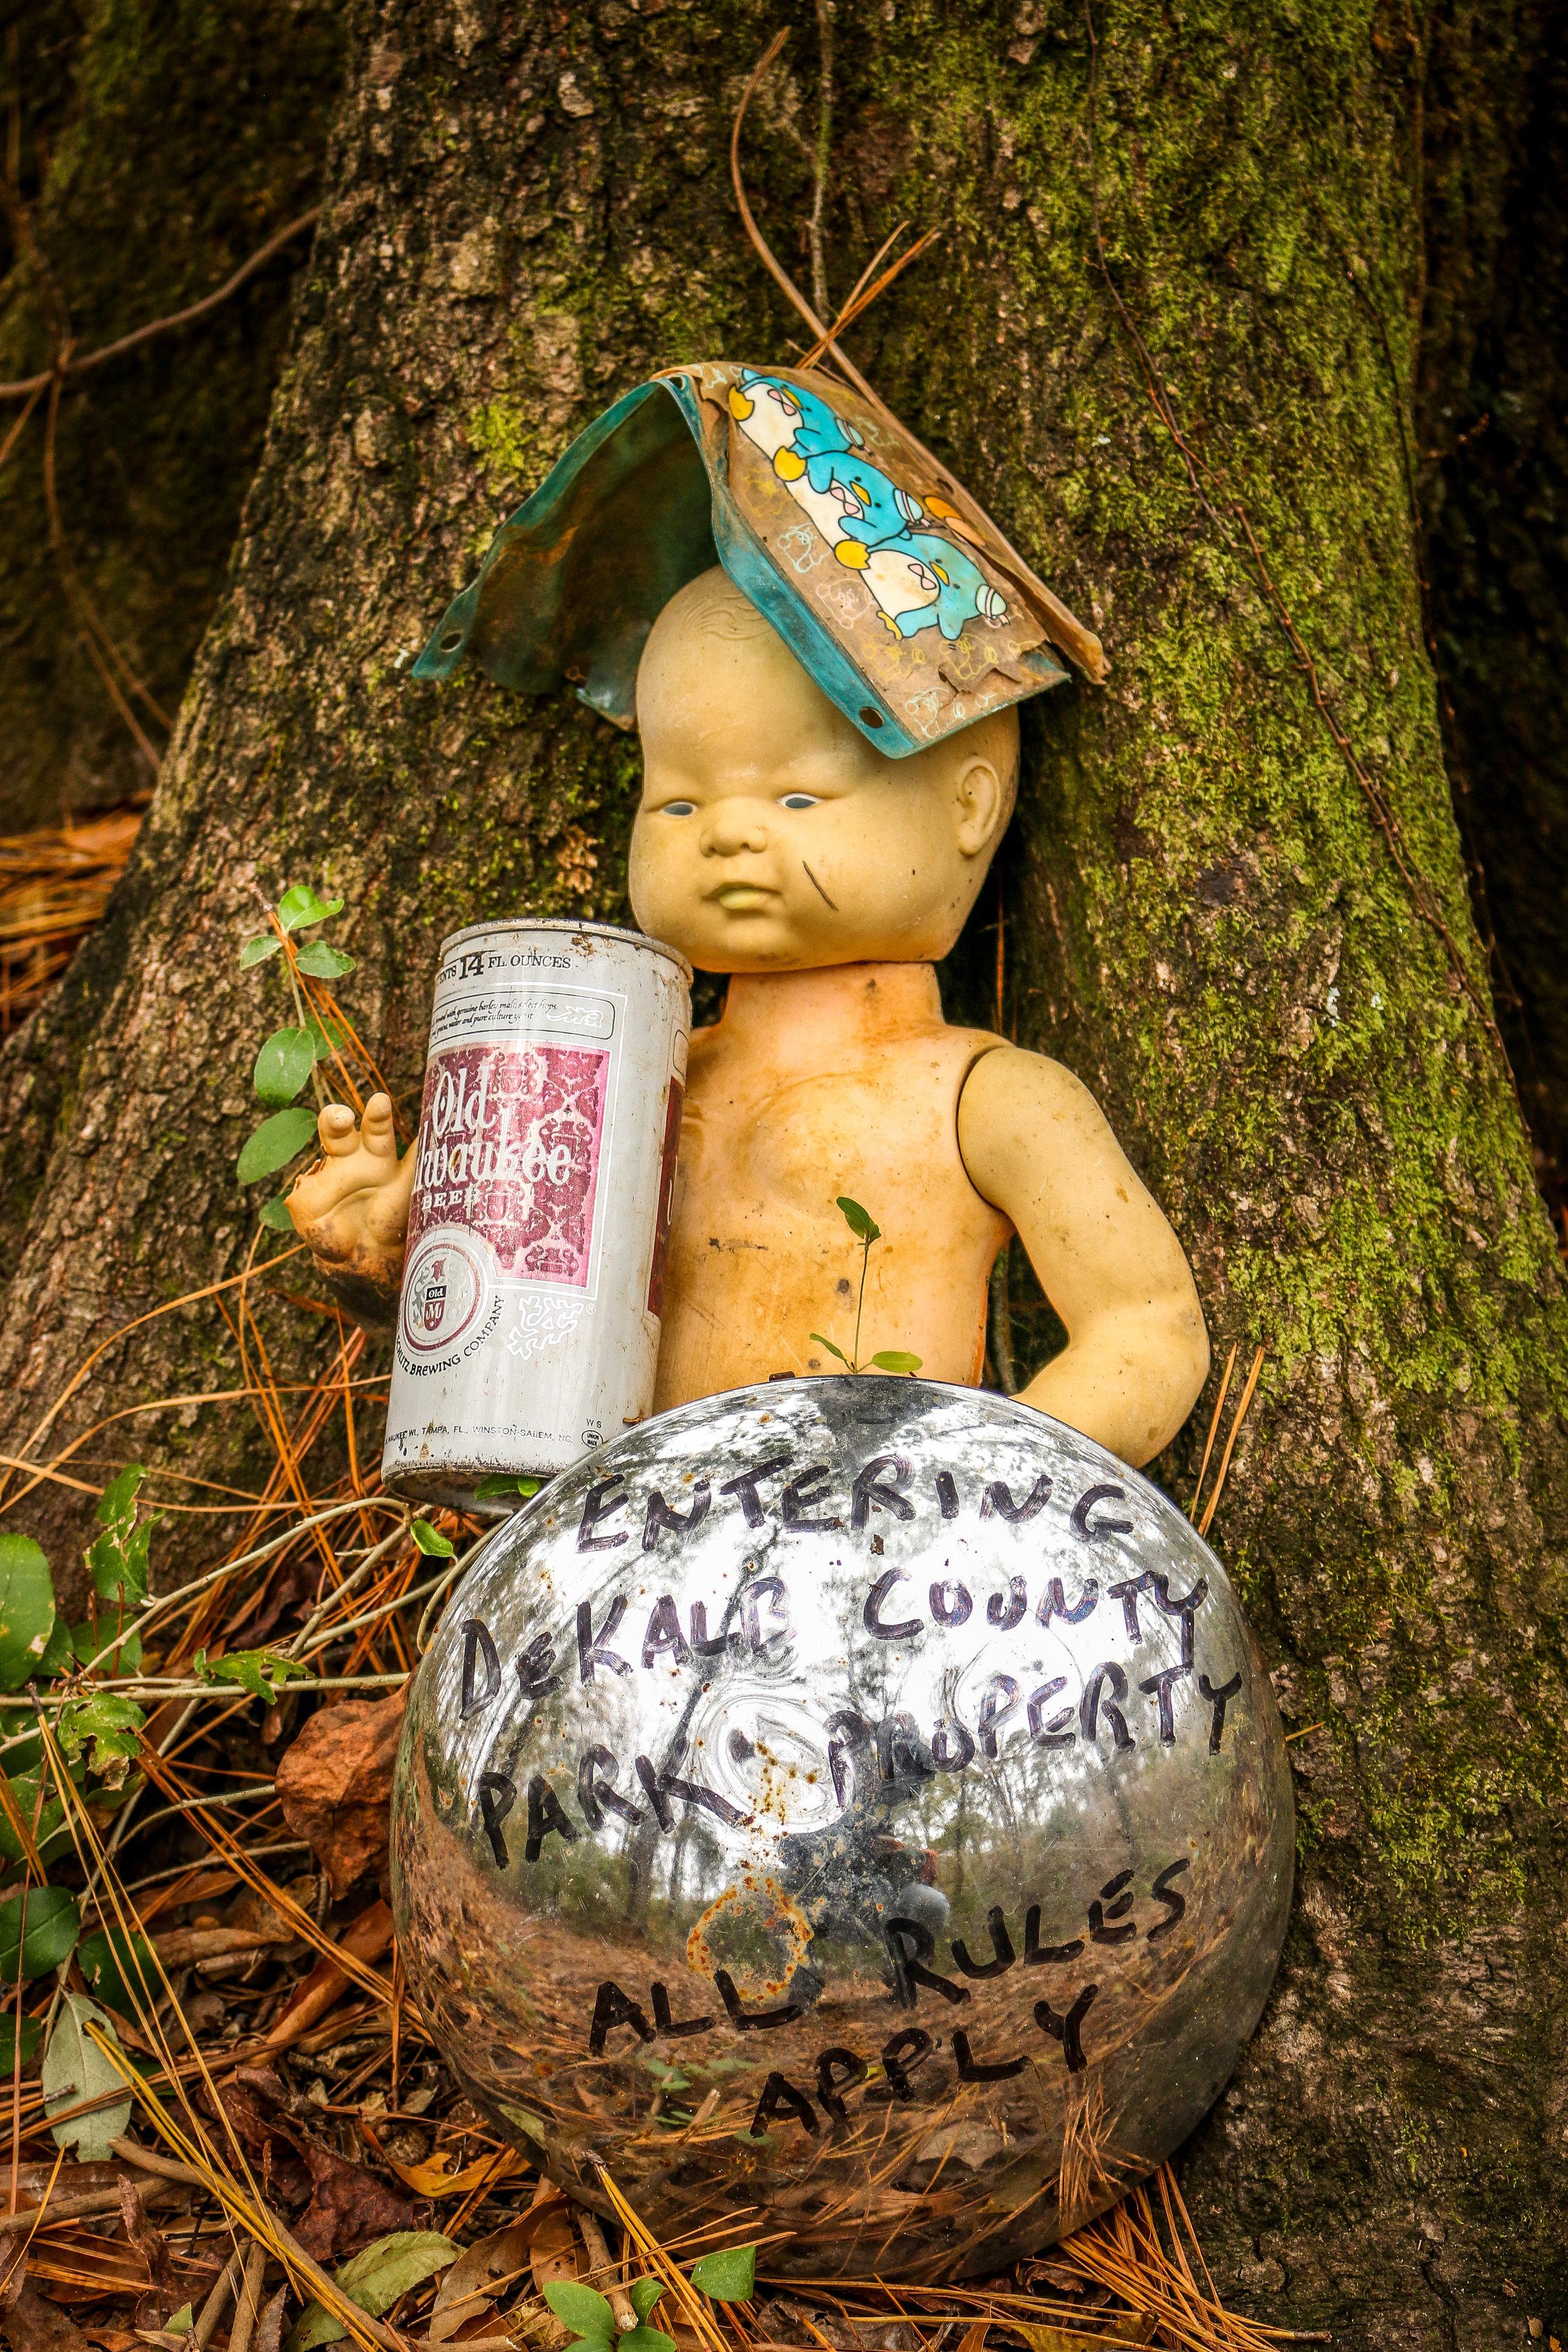 creepy doll's head trail constitution lakes atlanta georgia